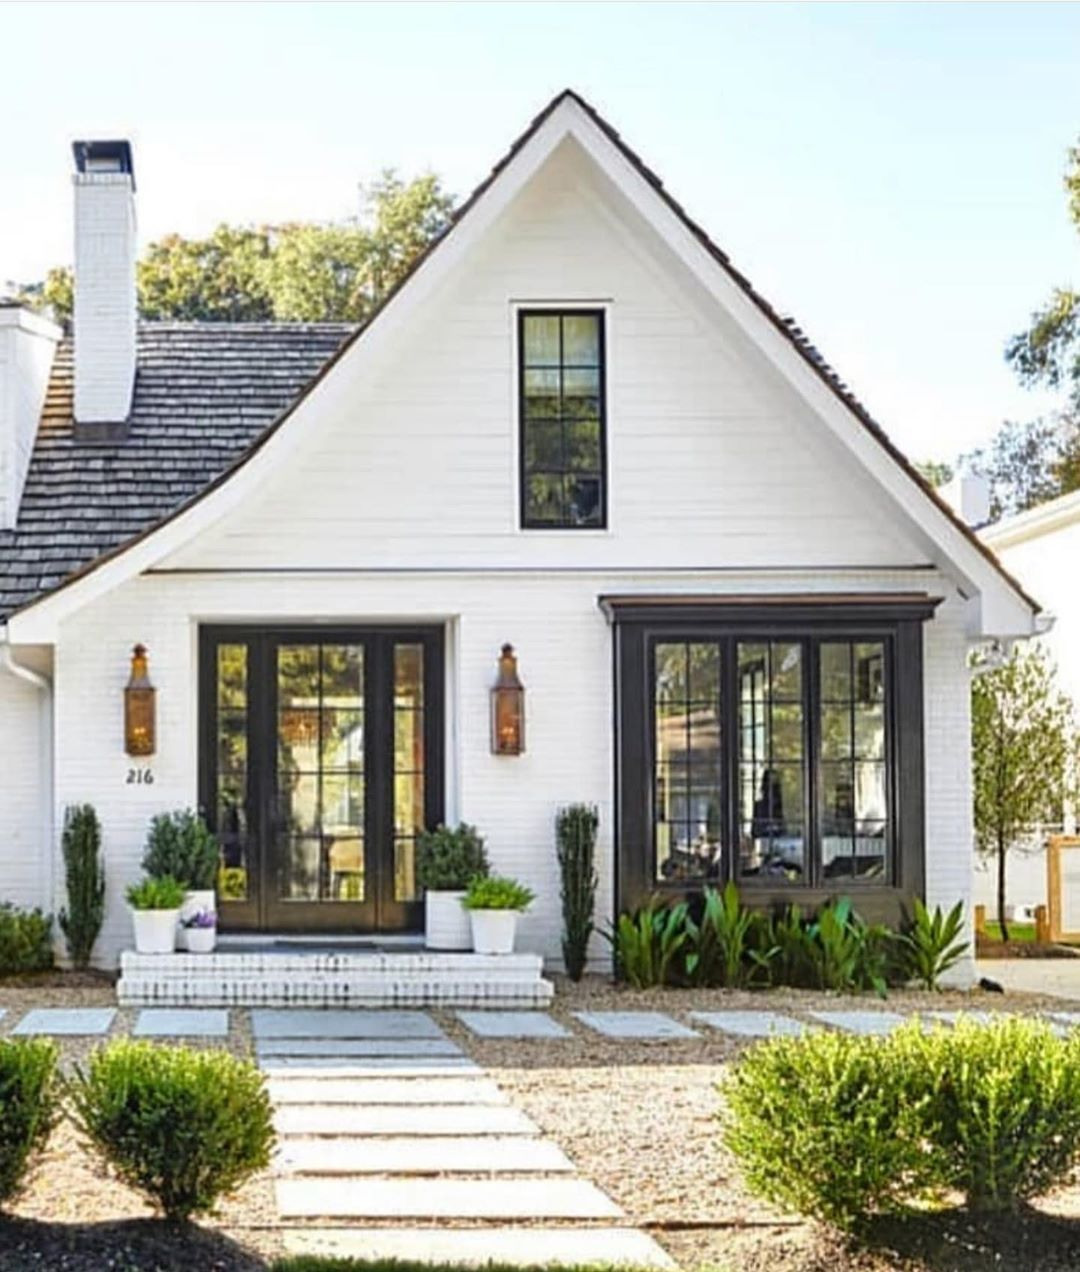 I Ve Learned That Home Isn T A Place It S A Feeling Home Via Ansleyatlanta Betterhomesandgard Modern Farmhouse Exterior Cottage Exterior House Exterior